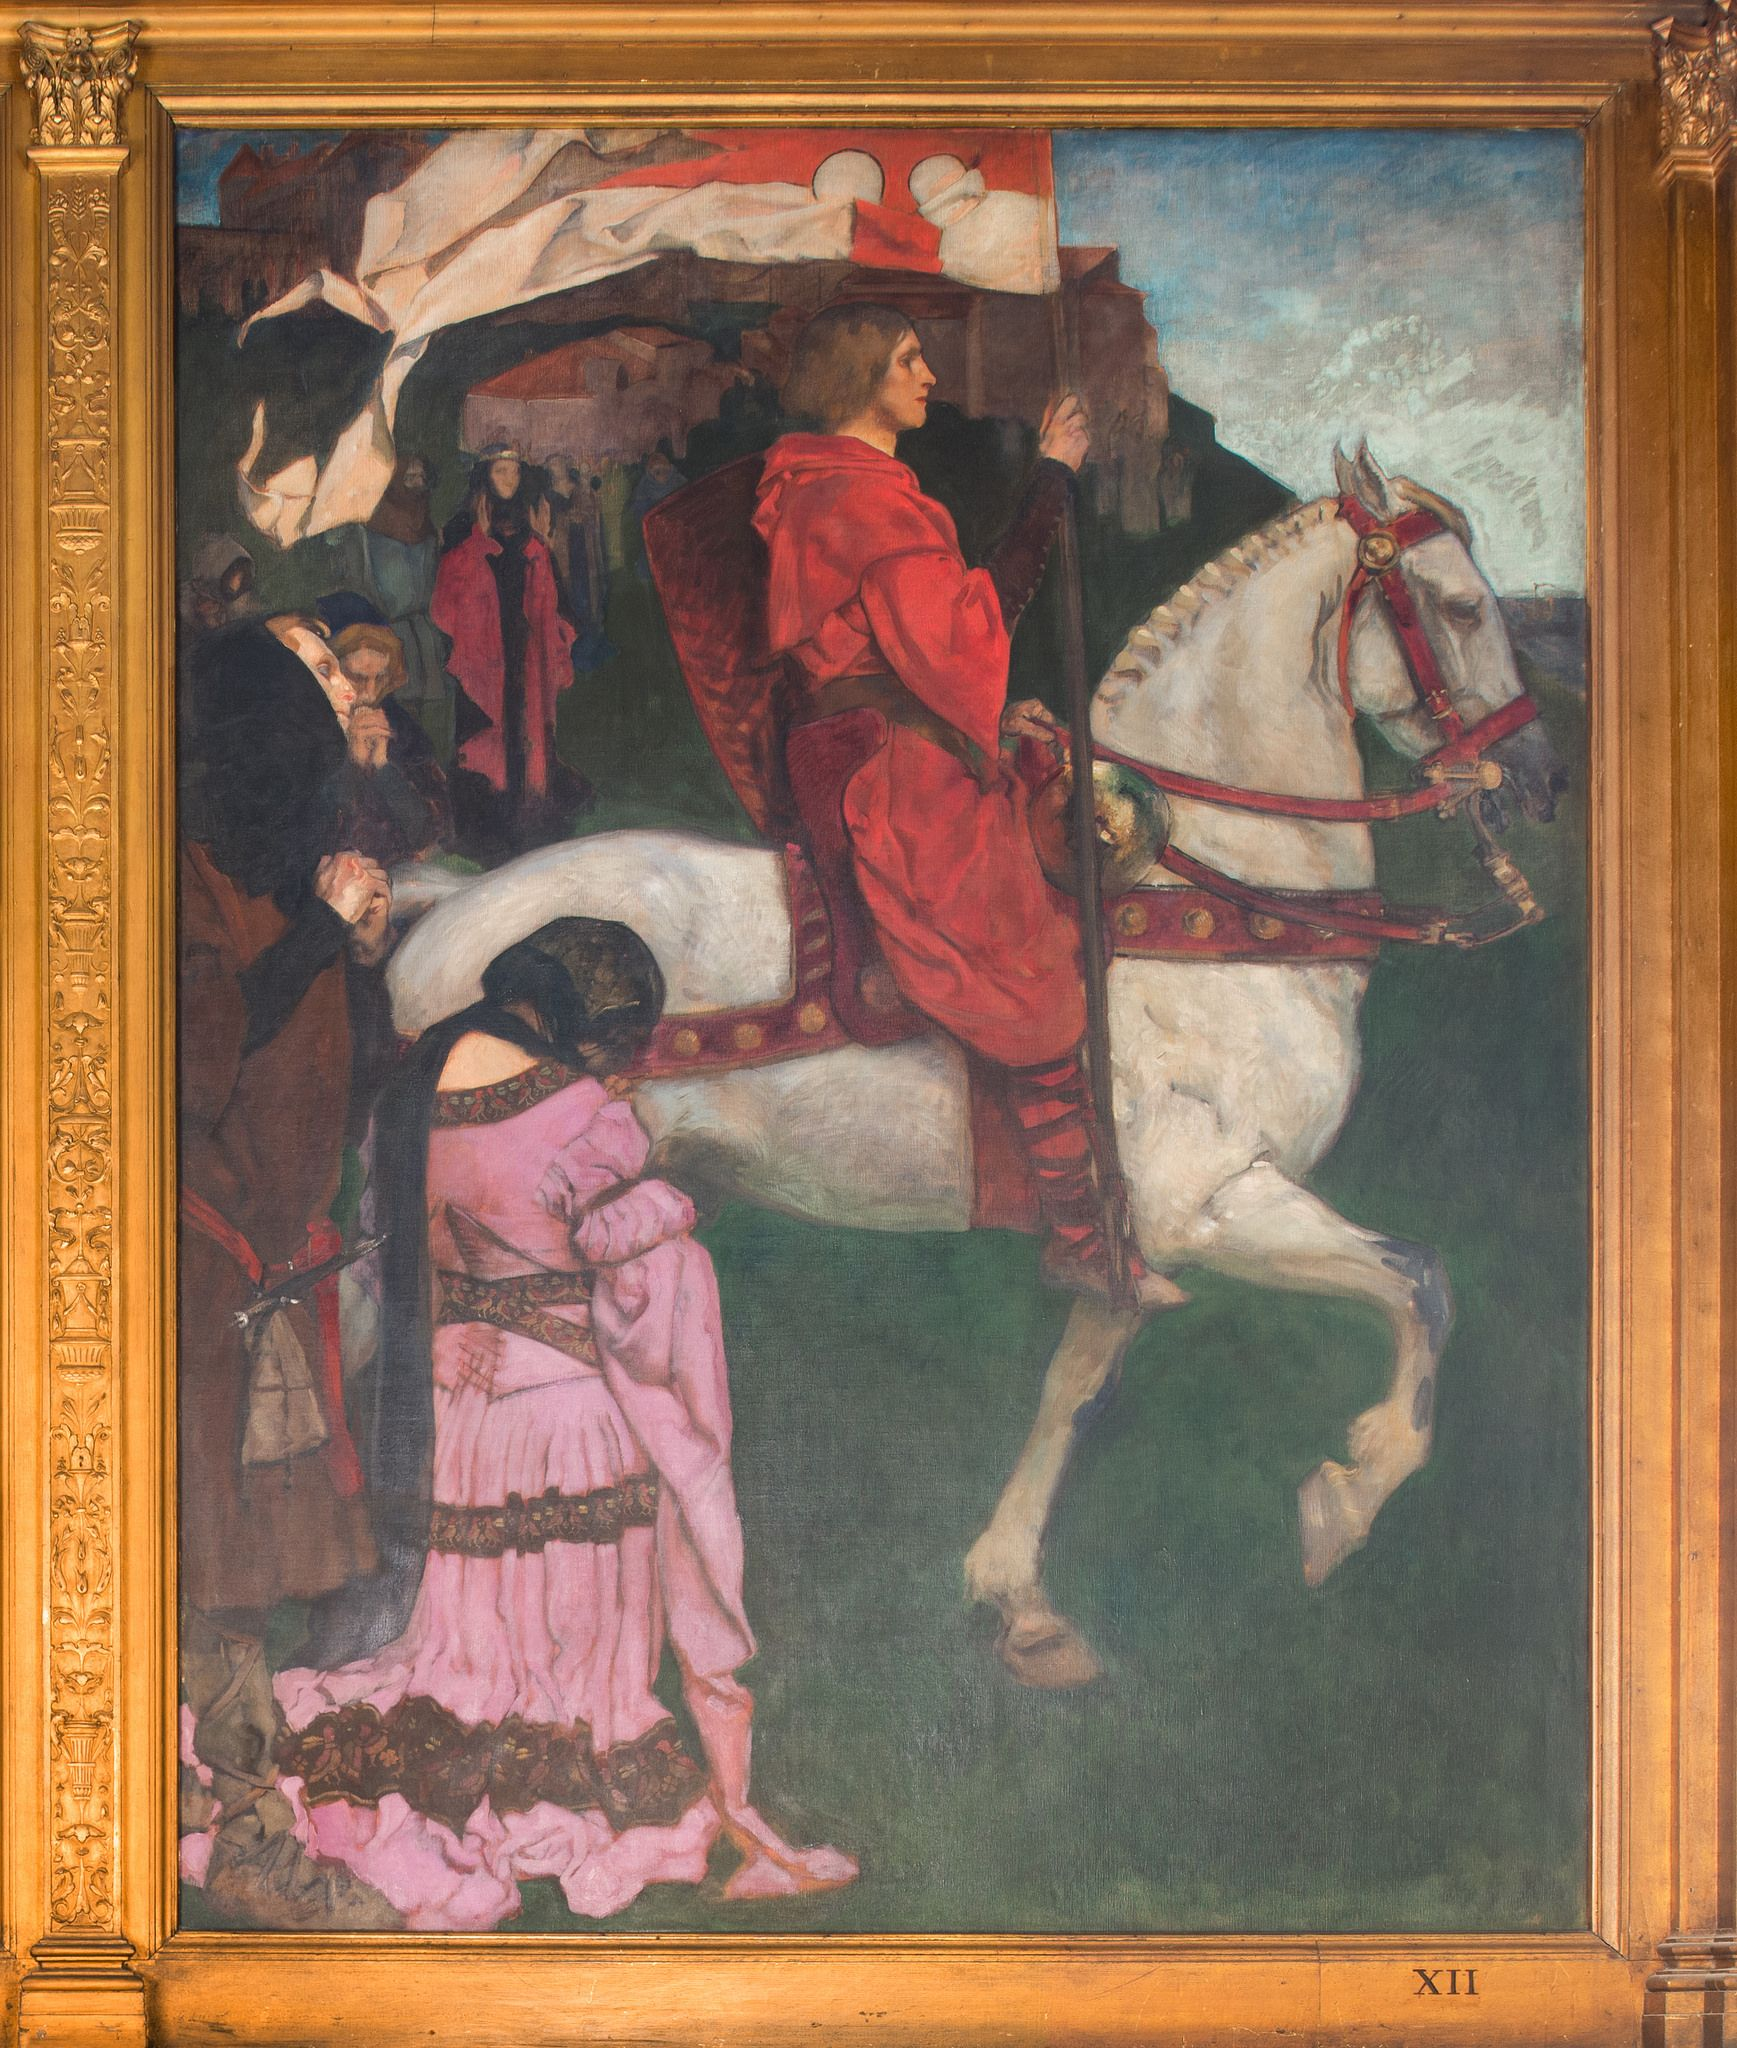 Xii Sir Galahad Passes From The Land Fairytale Art Fairytale Illustration King Arthur Legend